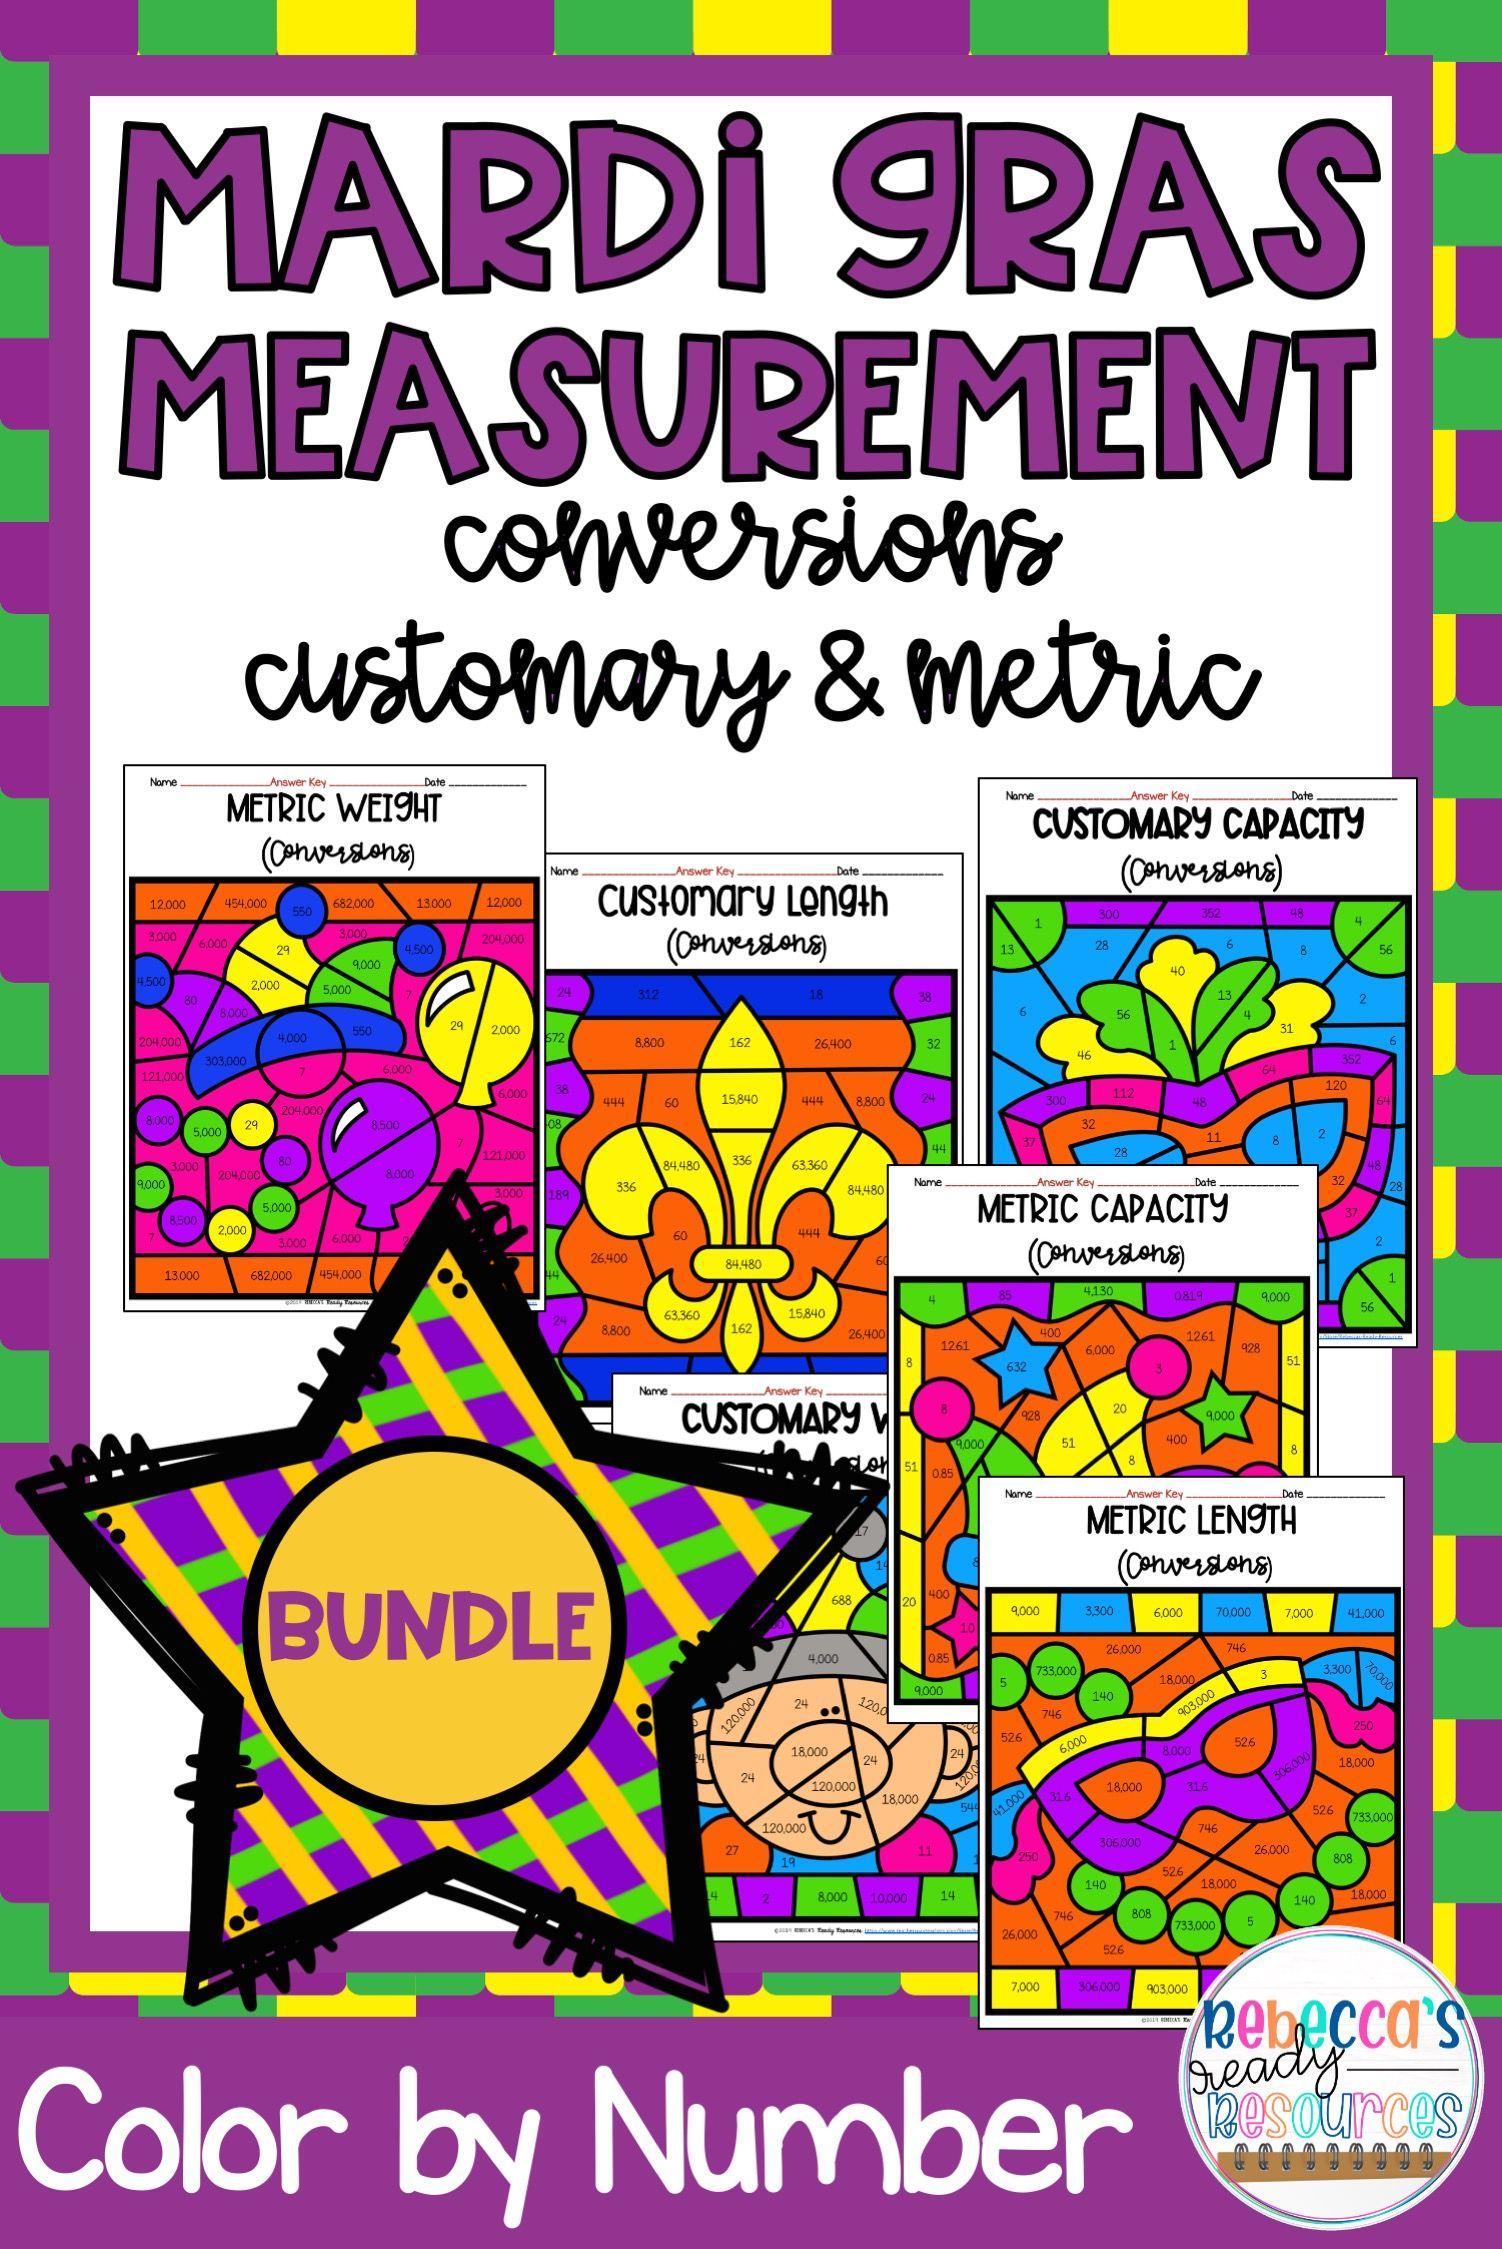 Mardi Gras Measurement Conversions Customary Amp Metric